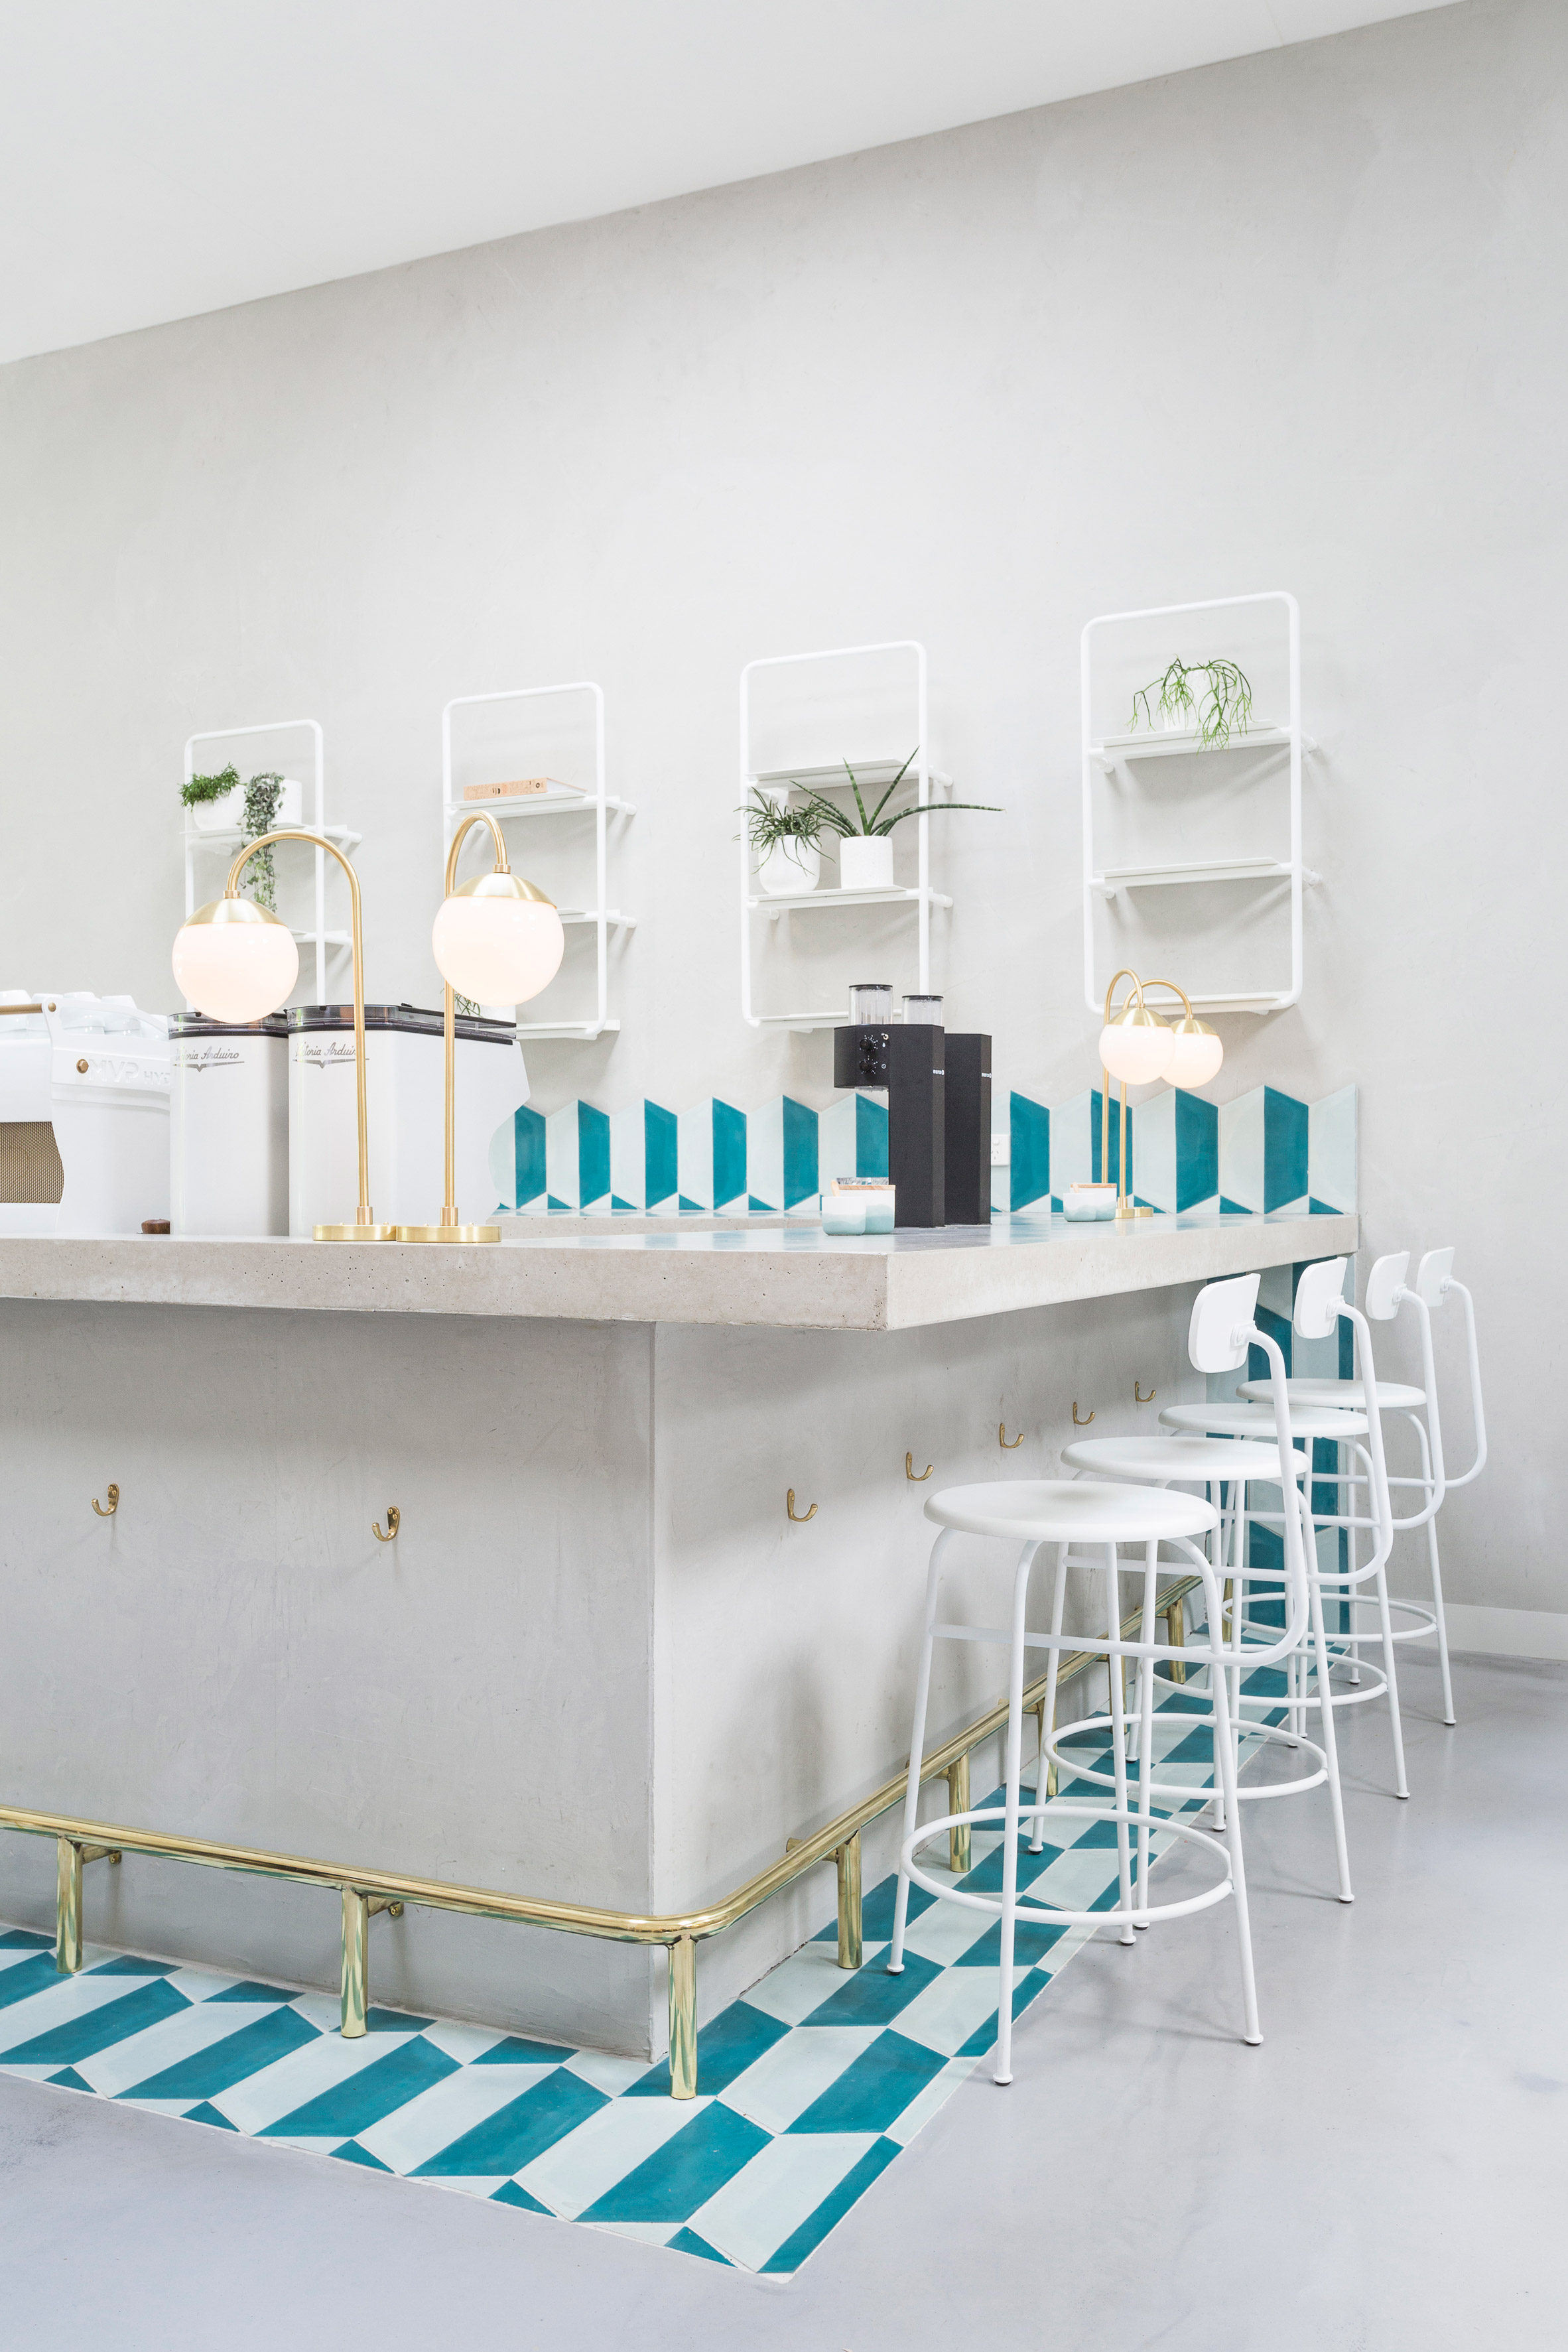 Biasol creates melbourne cafe interior based on s